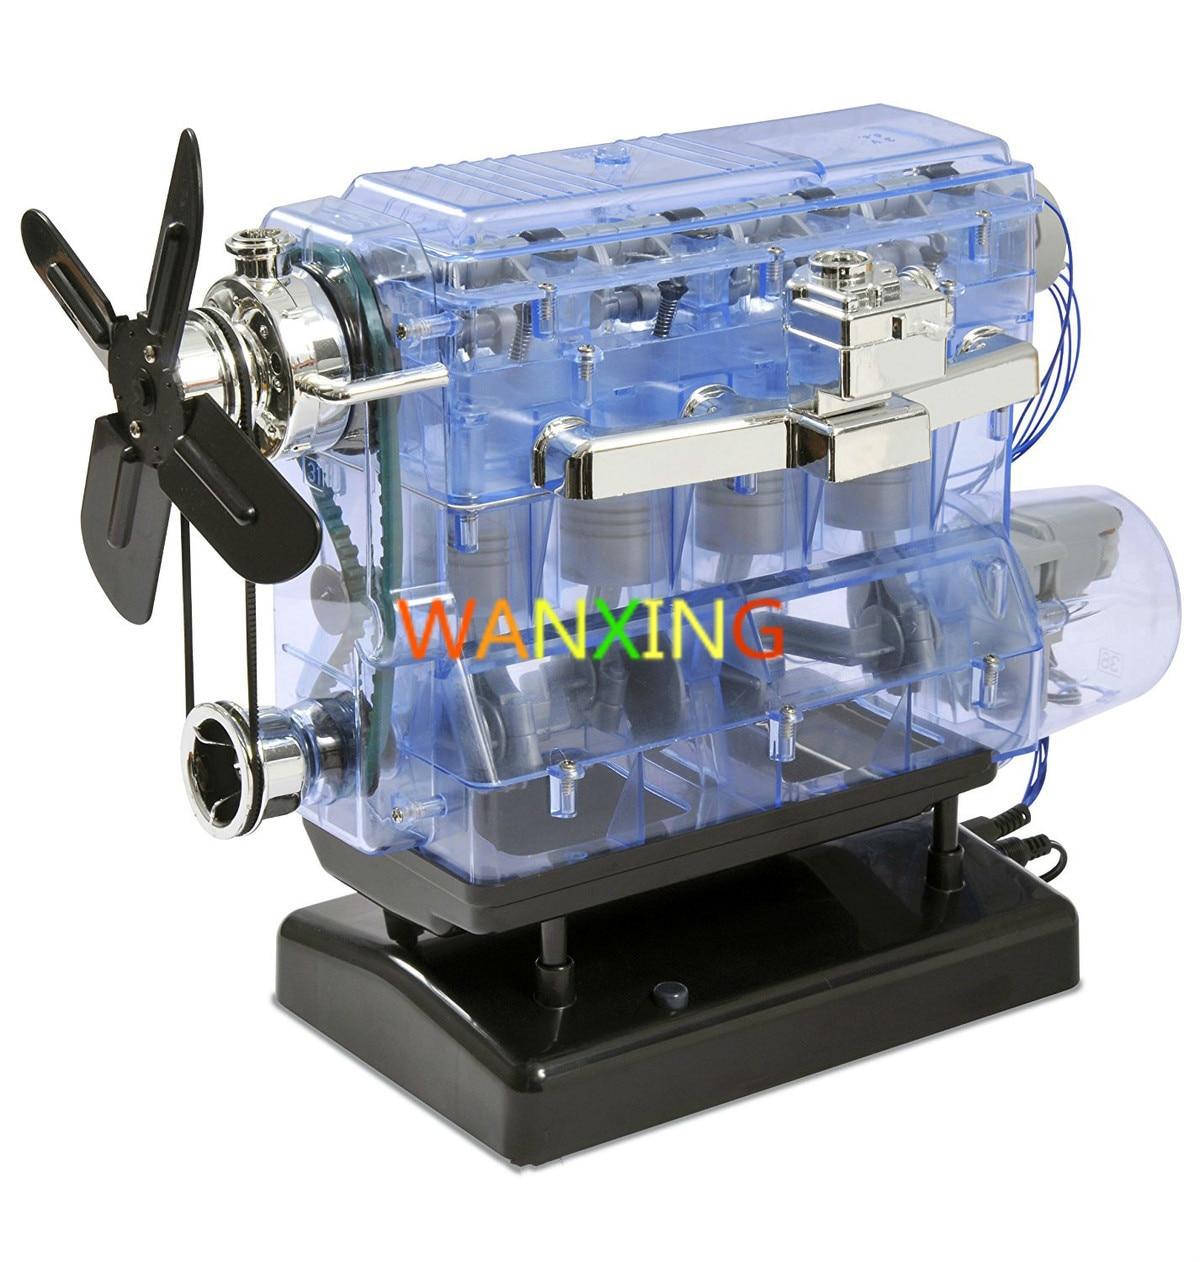 Engine Model Motor Drive Internal Combustion Engine Movable Engine Transparent Plastic Kit Physics Teaching Gift Hot Sale модель двигателя внутреннего сгорания